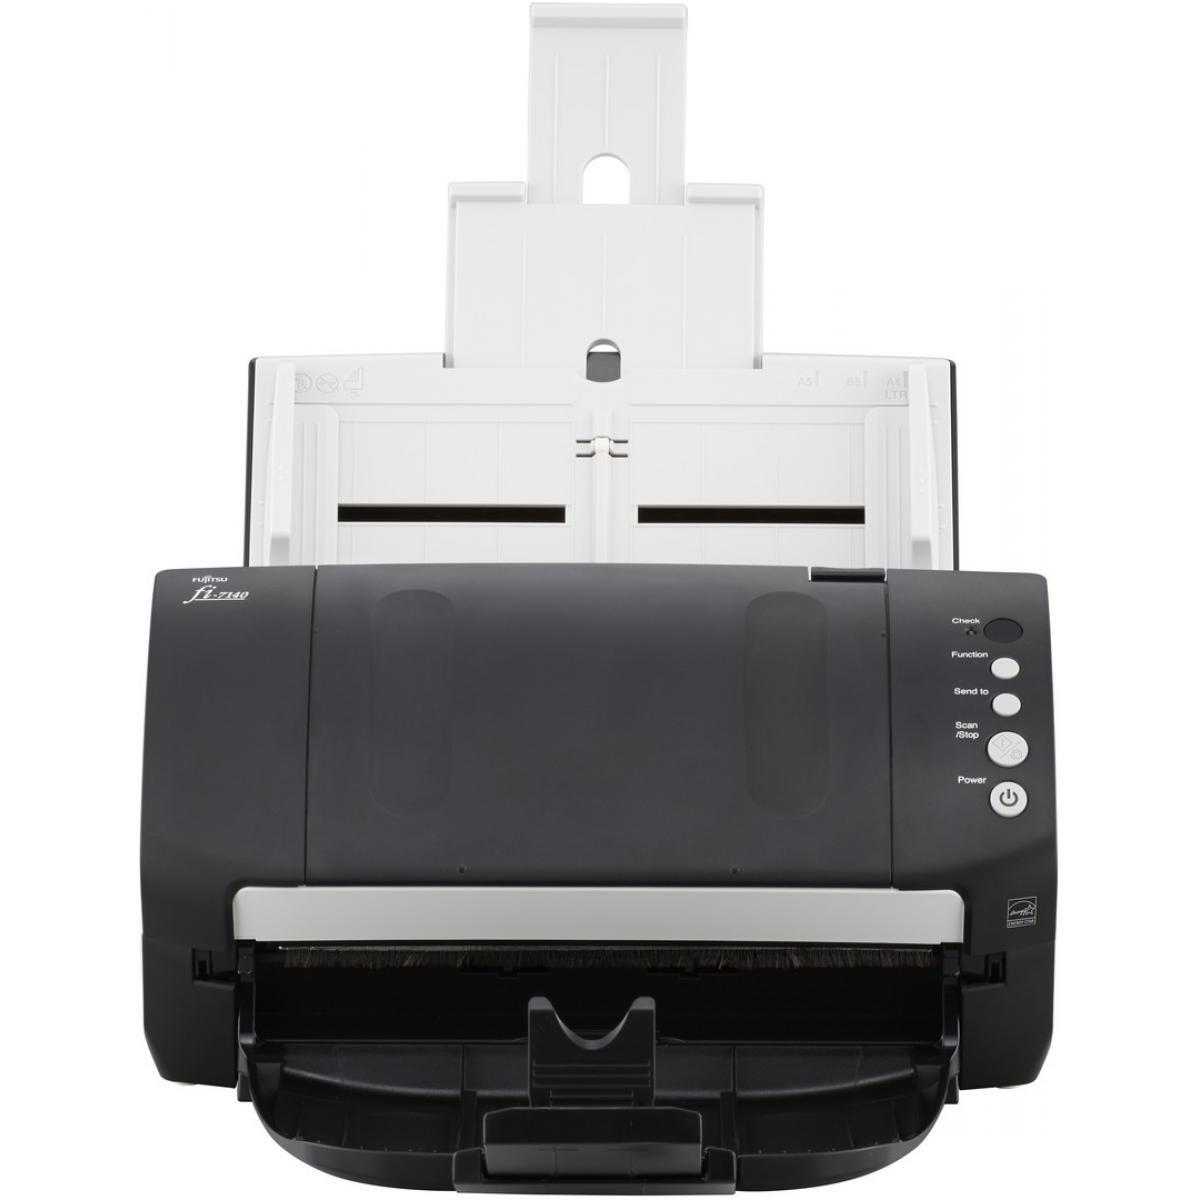 Fujitsu fi-7140 A4 Image Scanner